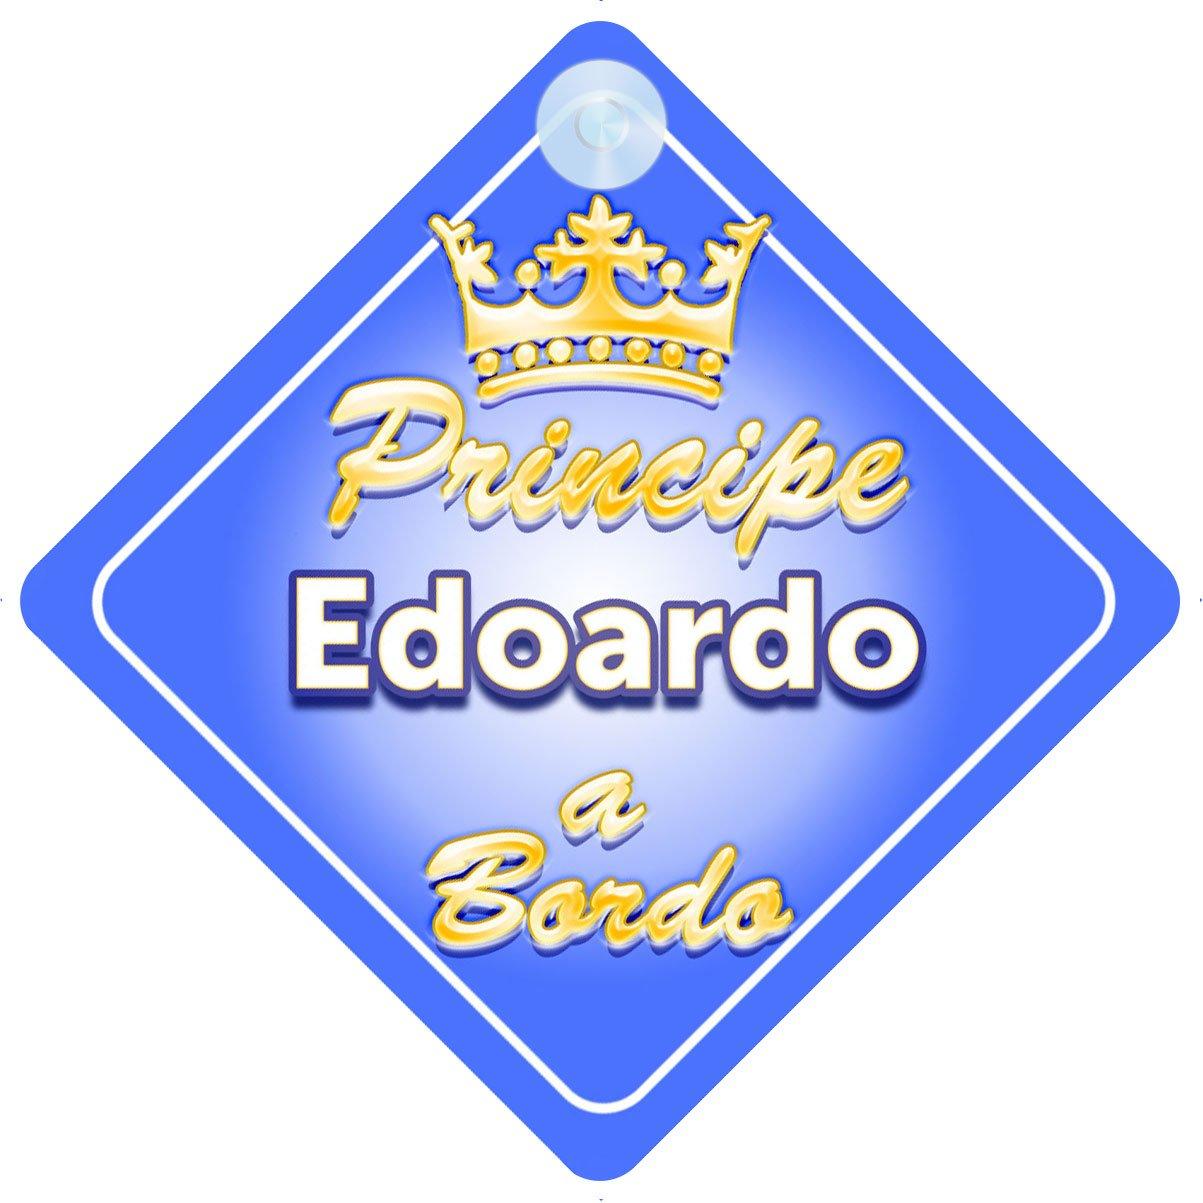 Corona (Crown) Principe Edoardo / adesivo bimbo / bambino / neonato a bordo per maschi principe / principino adesivo macchina Quality Goods Ltd